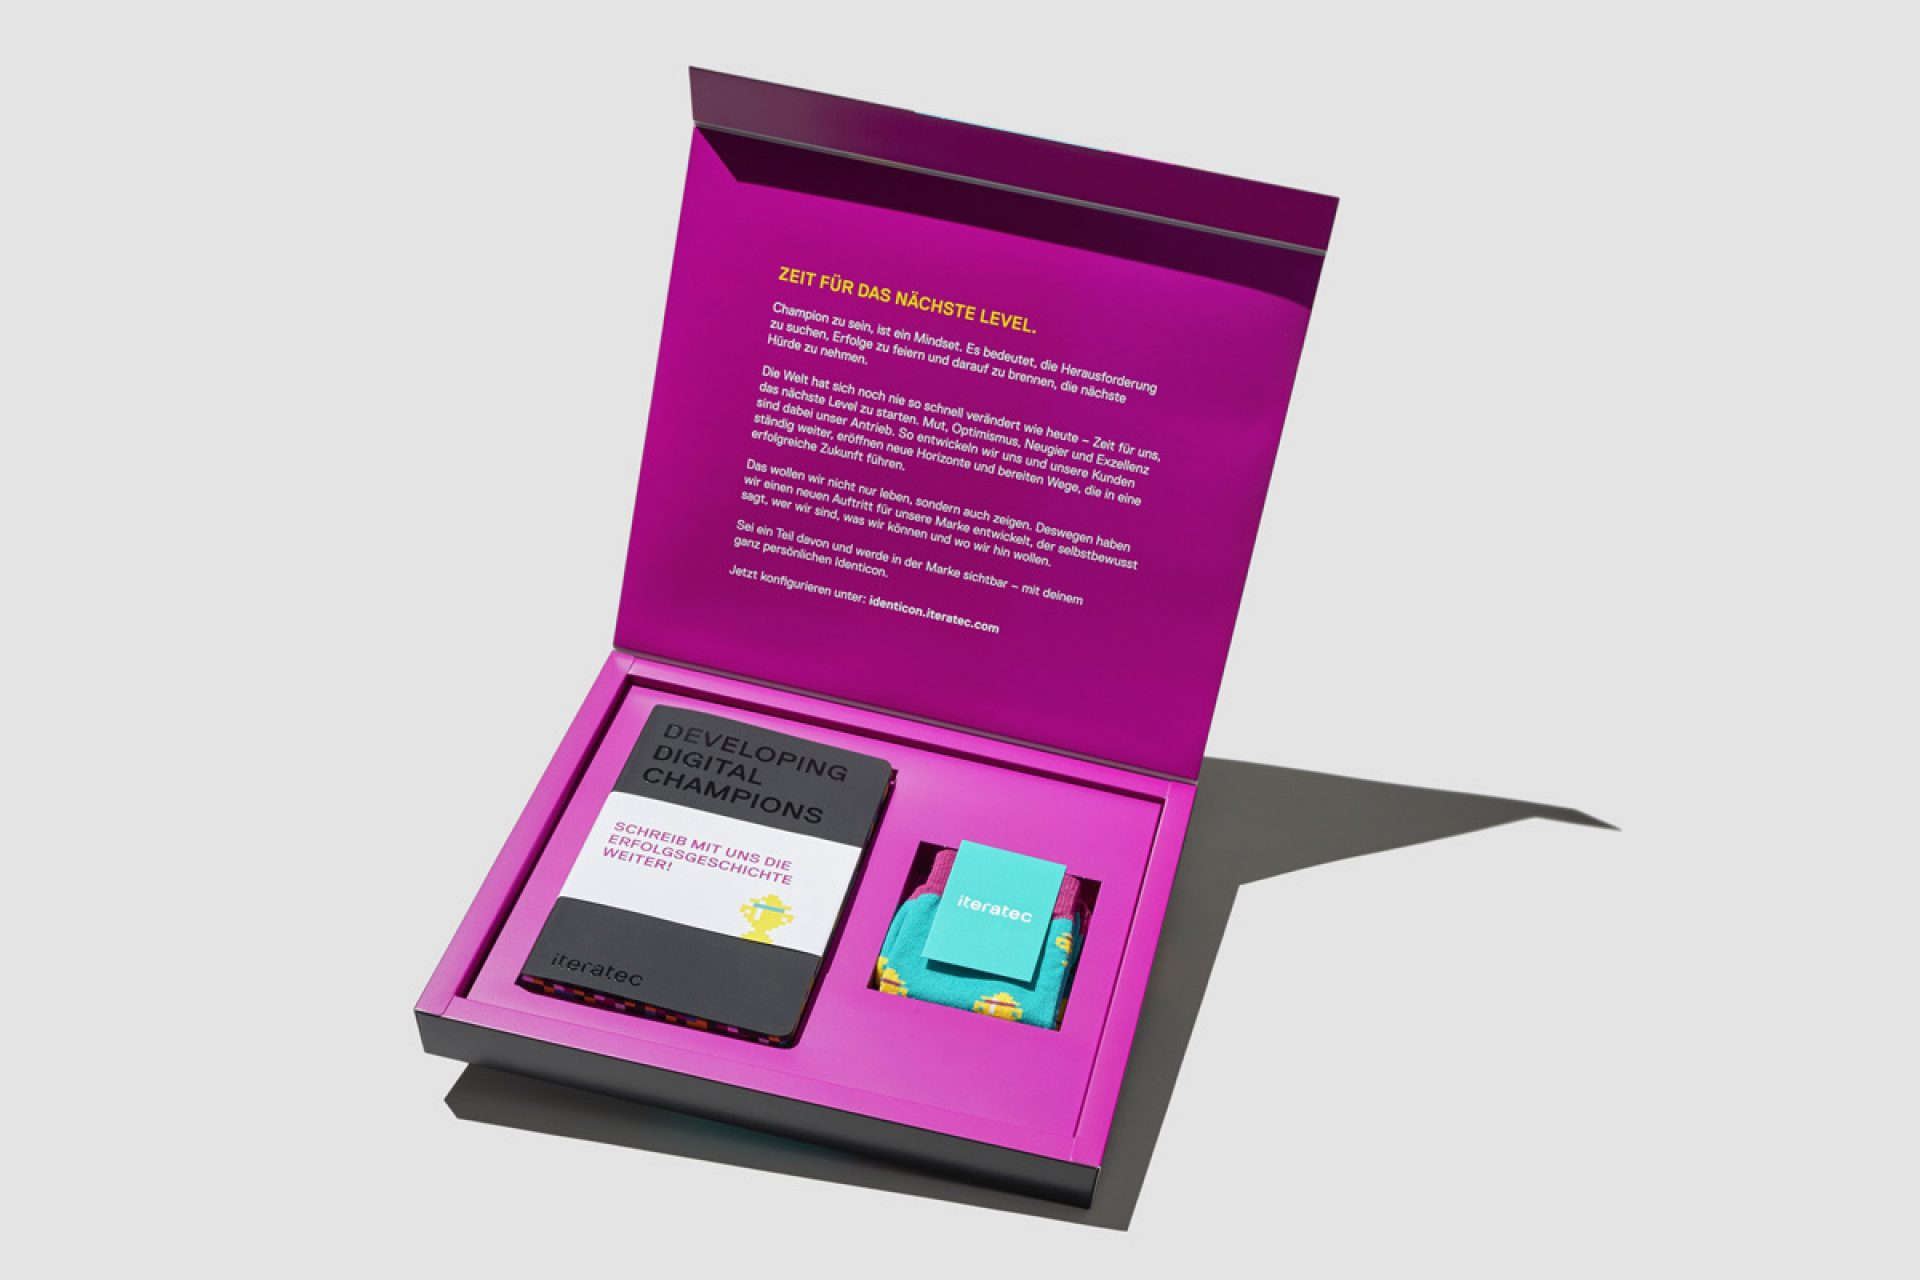 Iteratec Markenlaunch Starter Kit ligalux